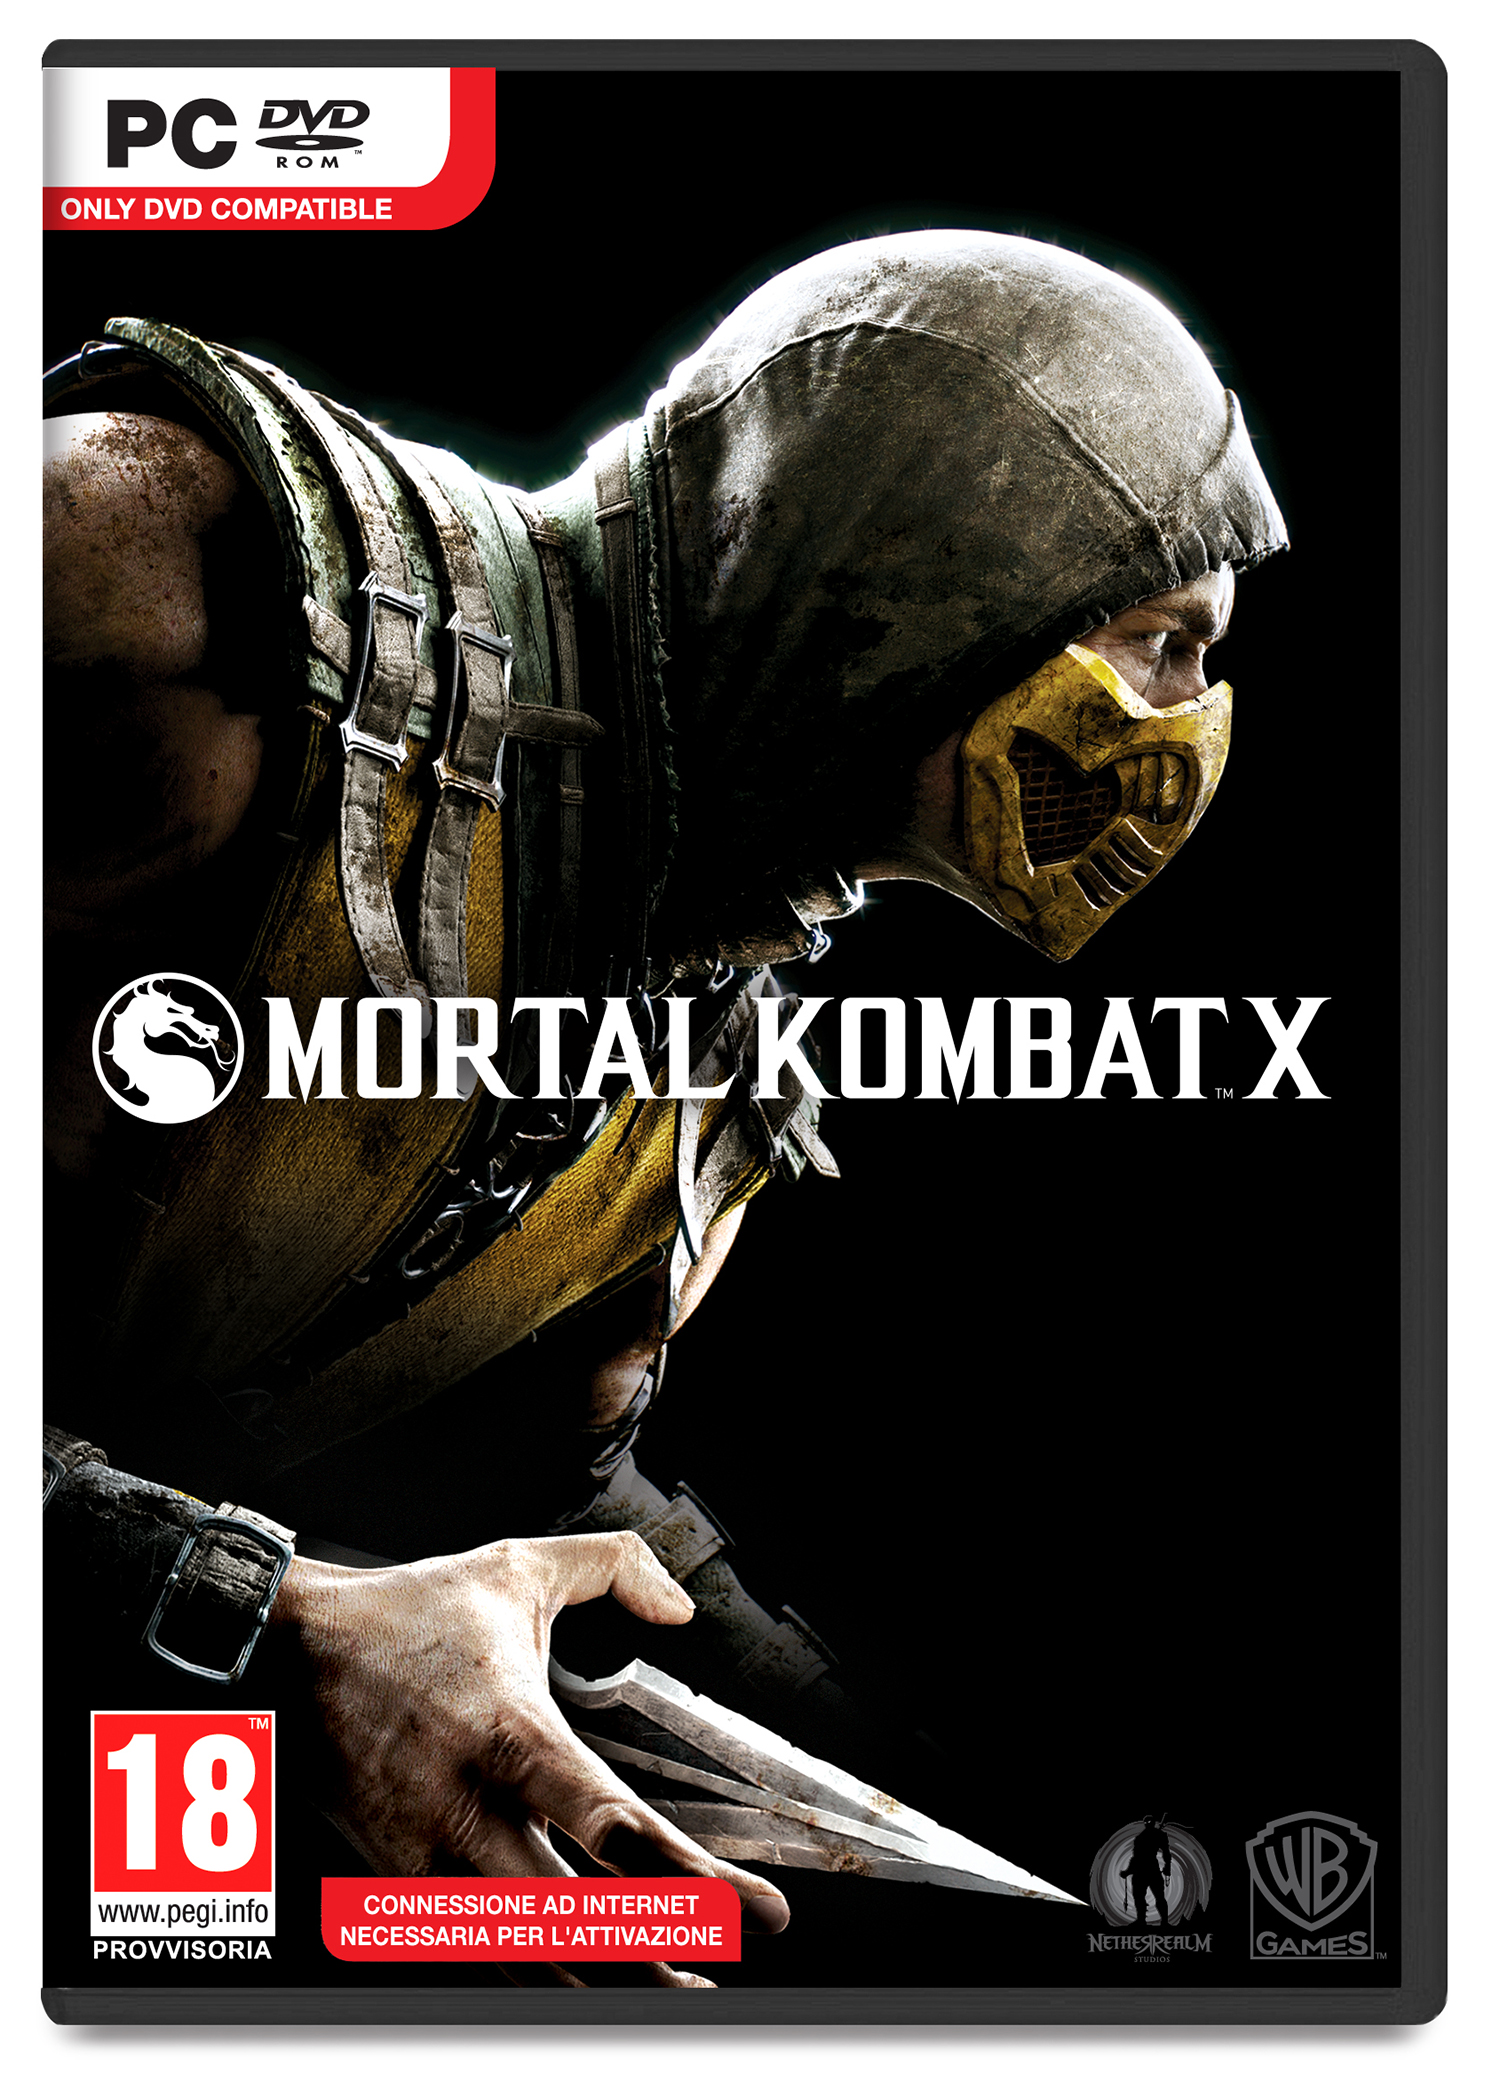 Mortal Kombat X PC cover